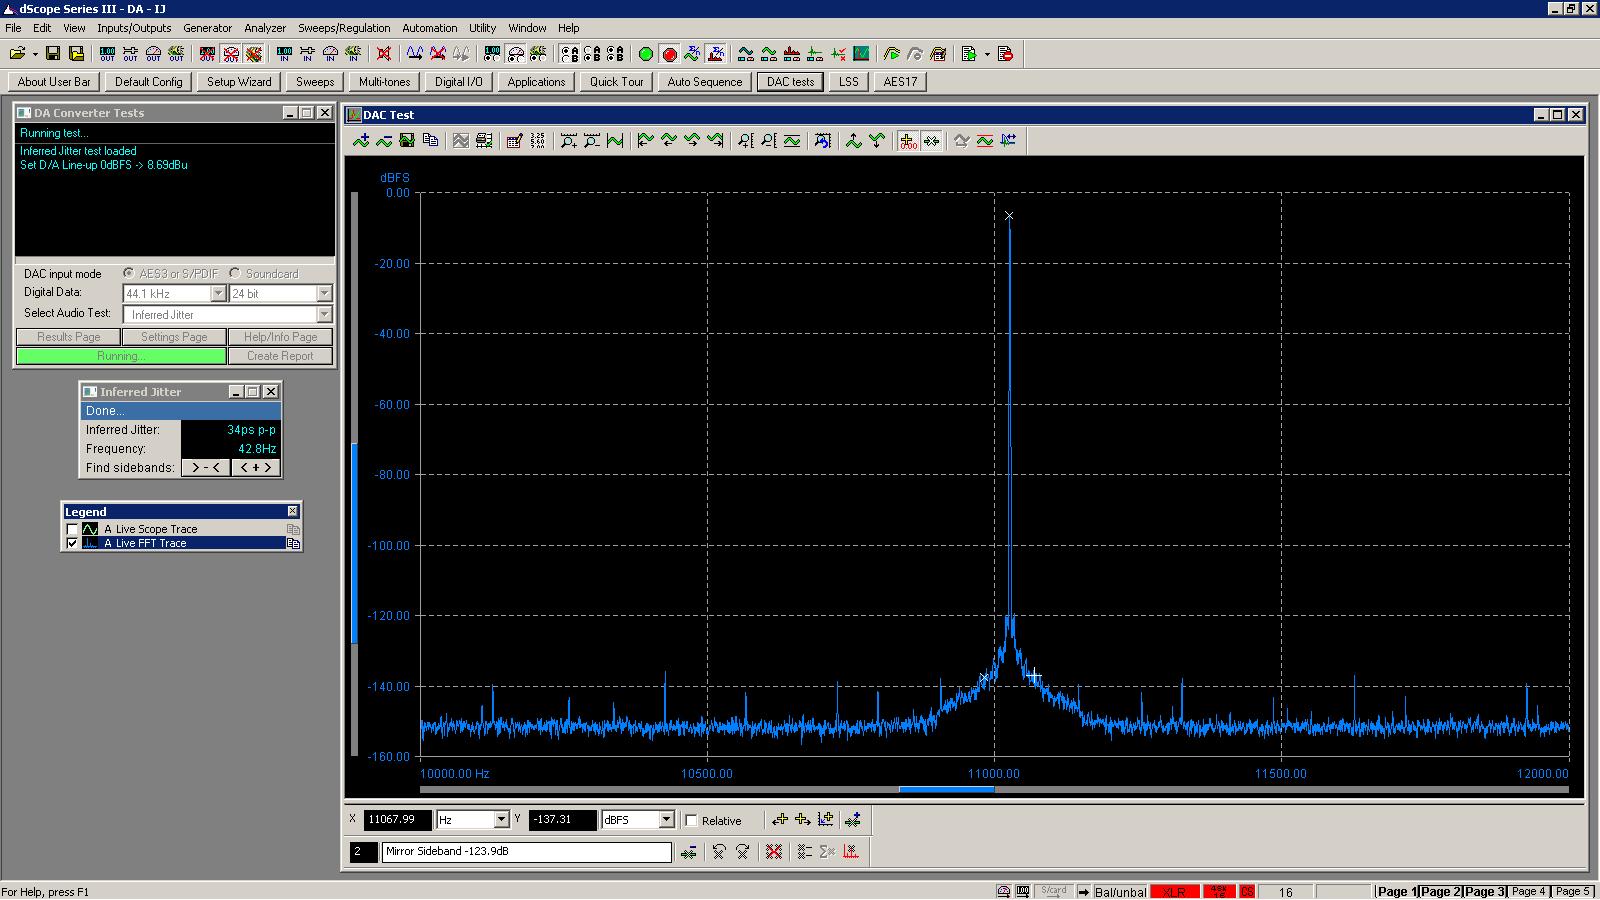 20160812 Modi MB inferred jitter - 2KHz BW - toslink.png